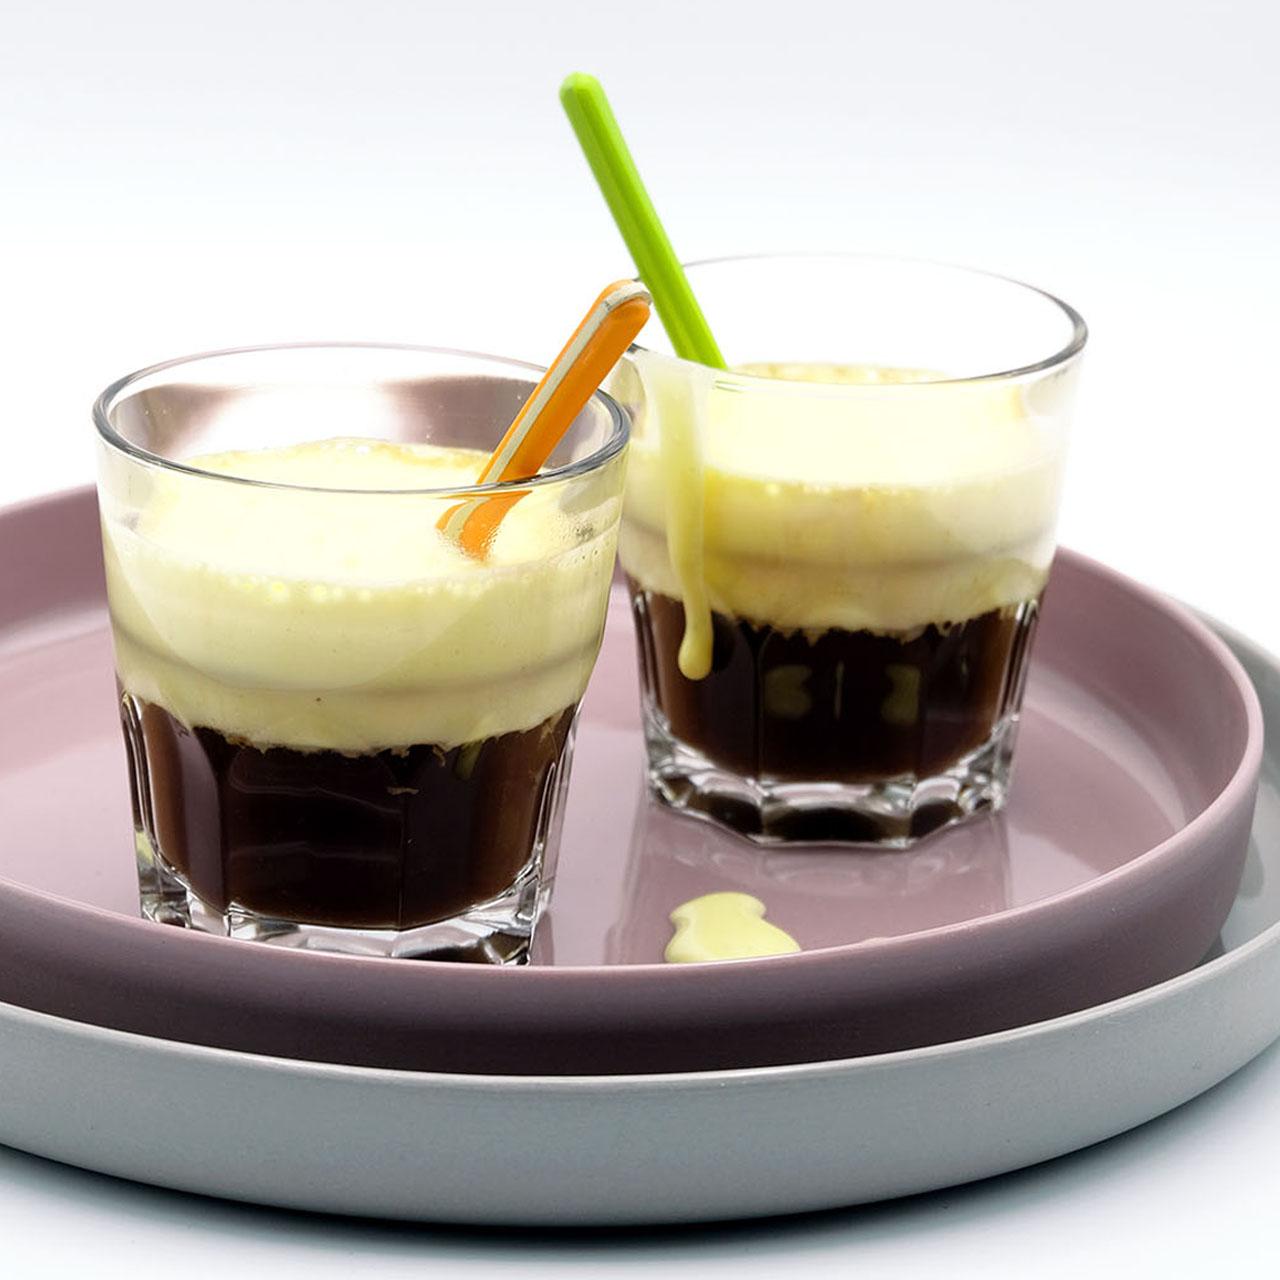 Rezept vietnamesischer Eierkaffee Ca Phe Trung Popdish Foodblog, Gerichte, die knallen,